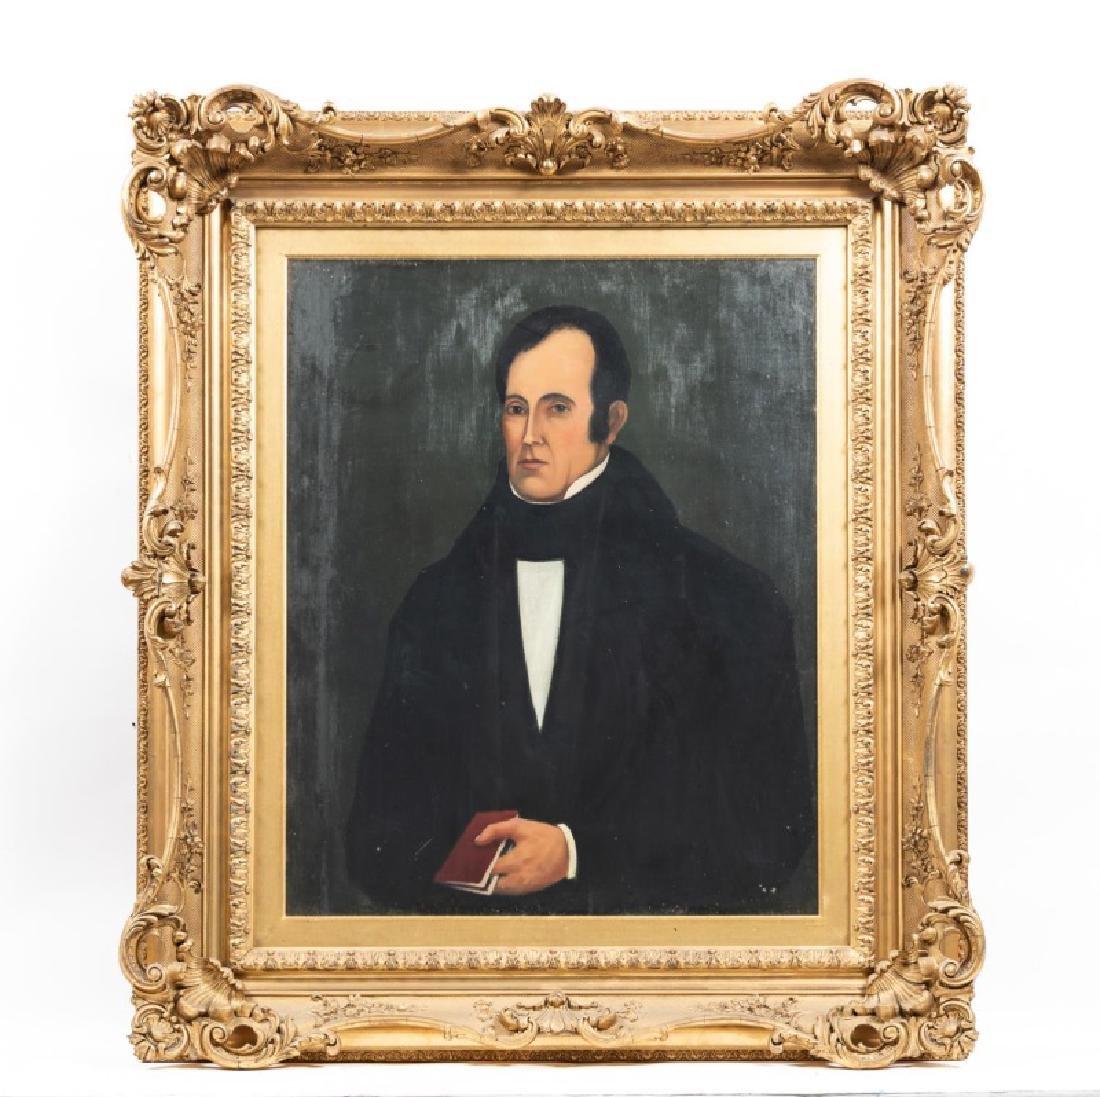 American School Portrait of Kingsley Mason, 19th C